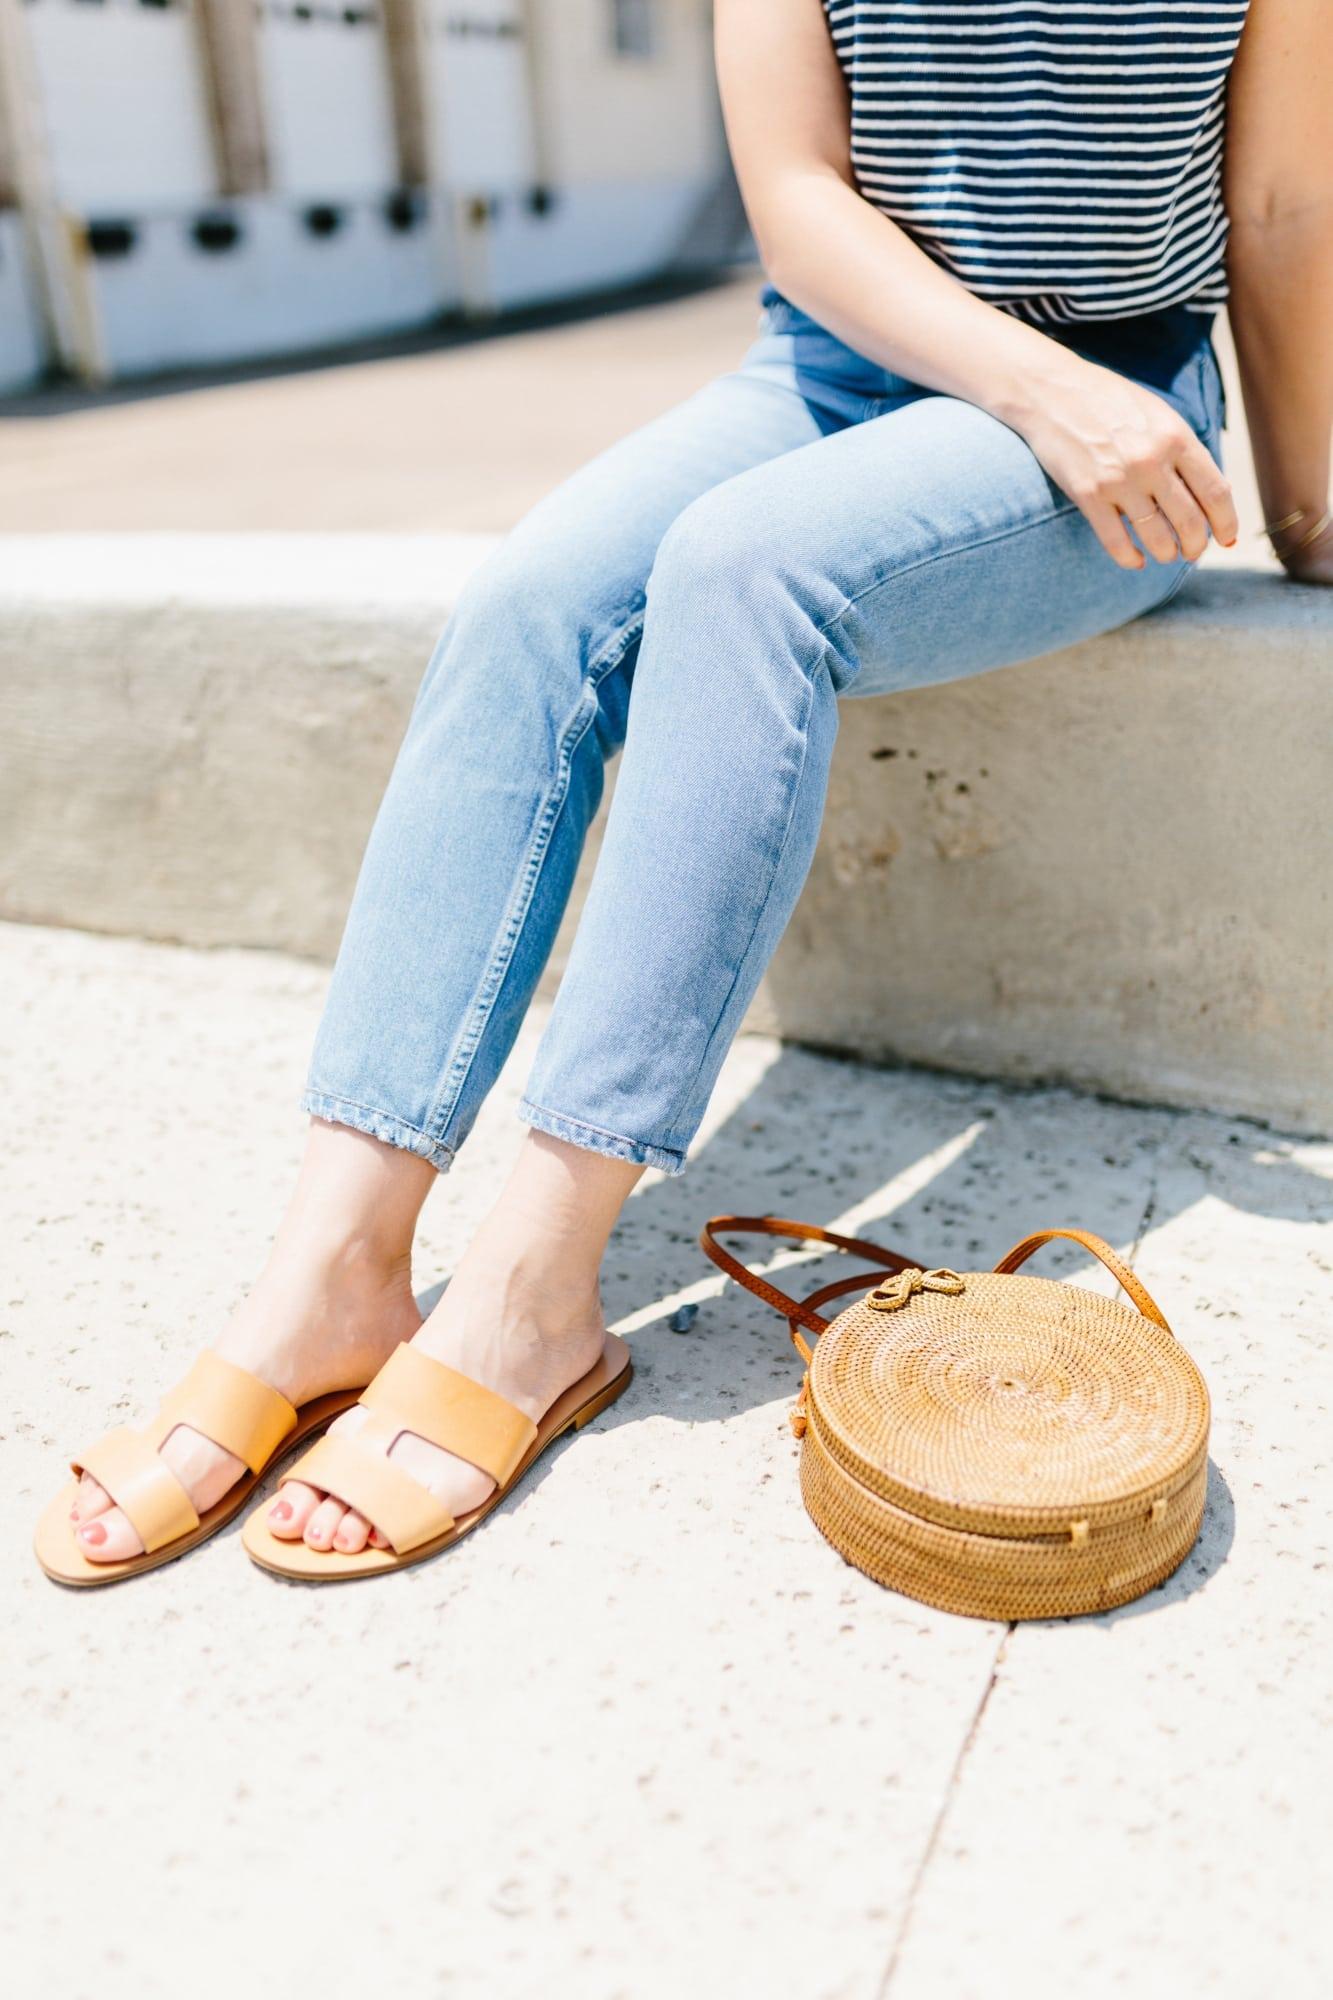 Everlane Tan Sandals and Round Basket Bag